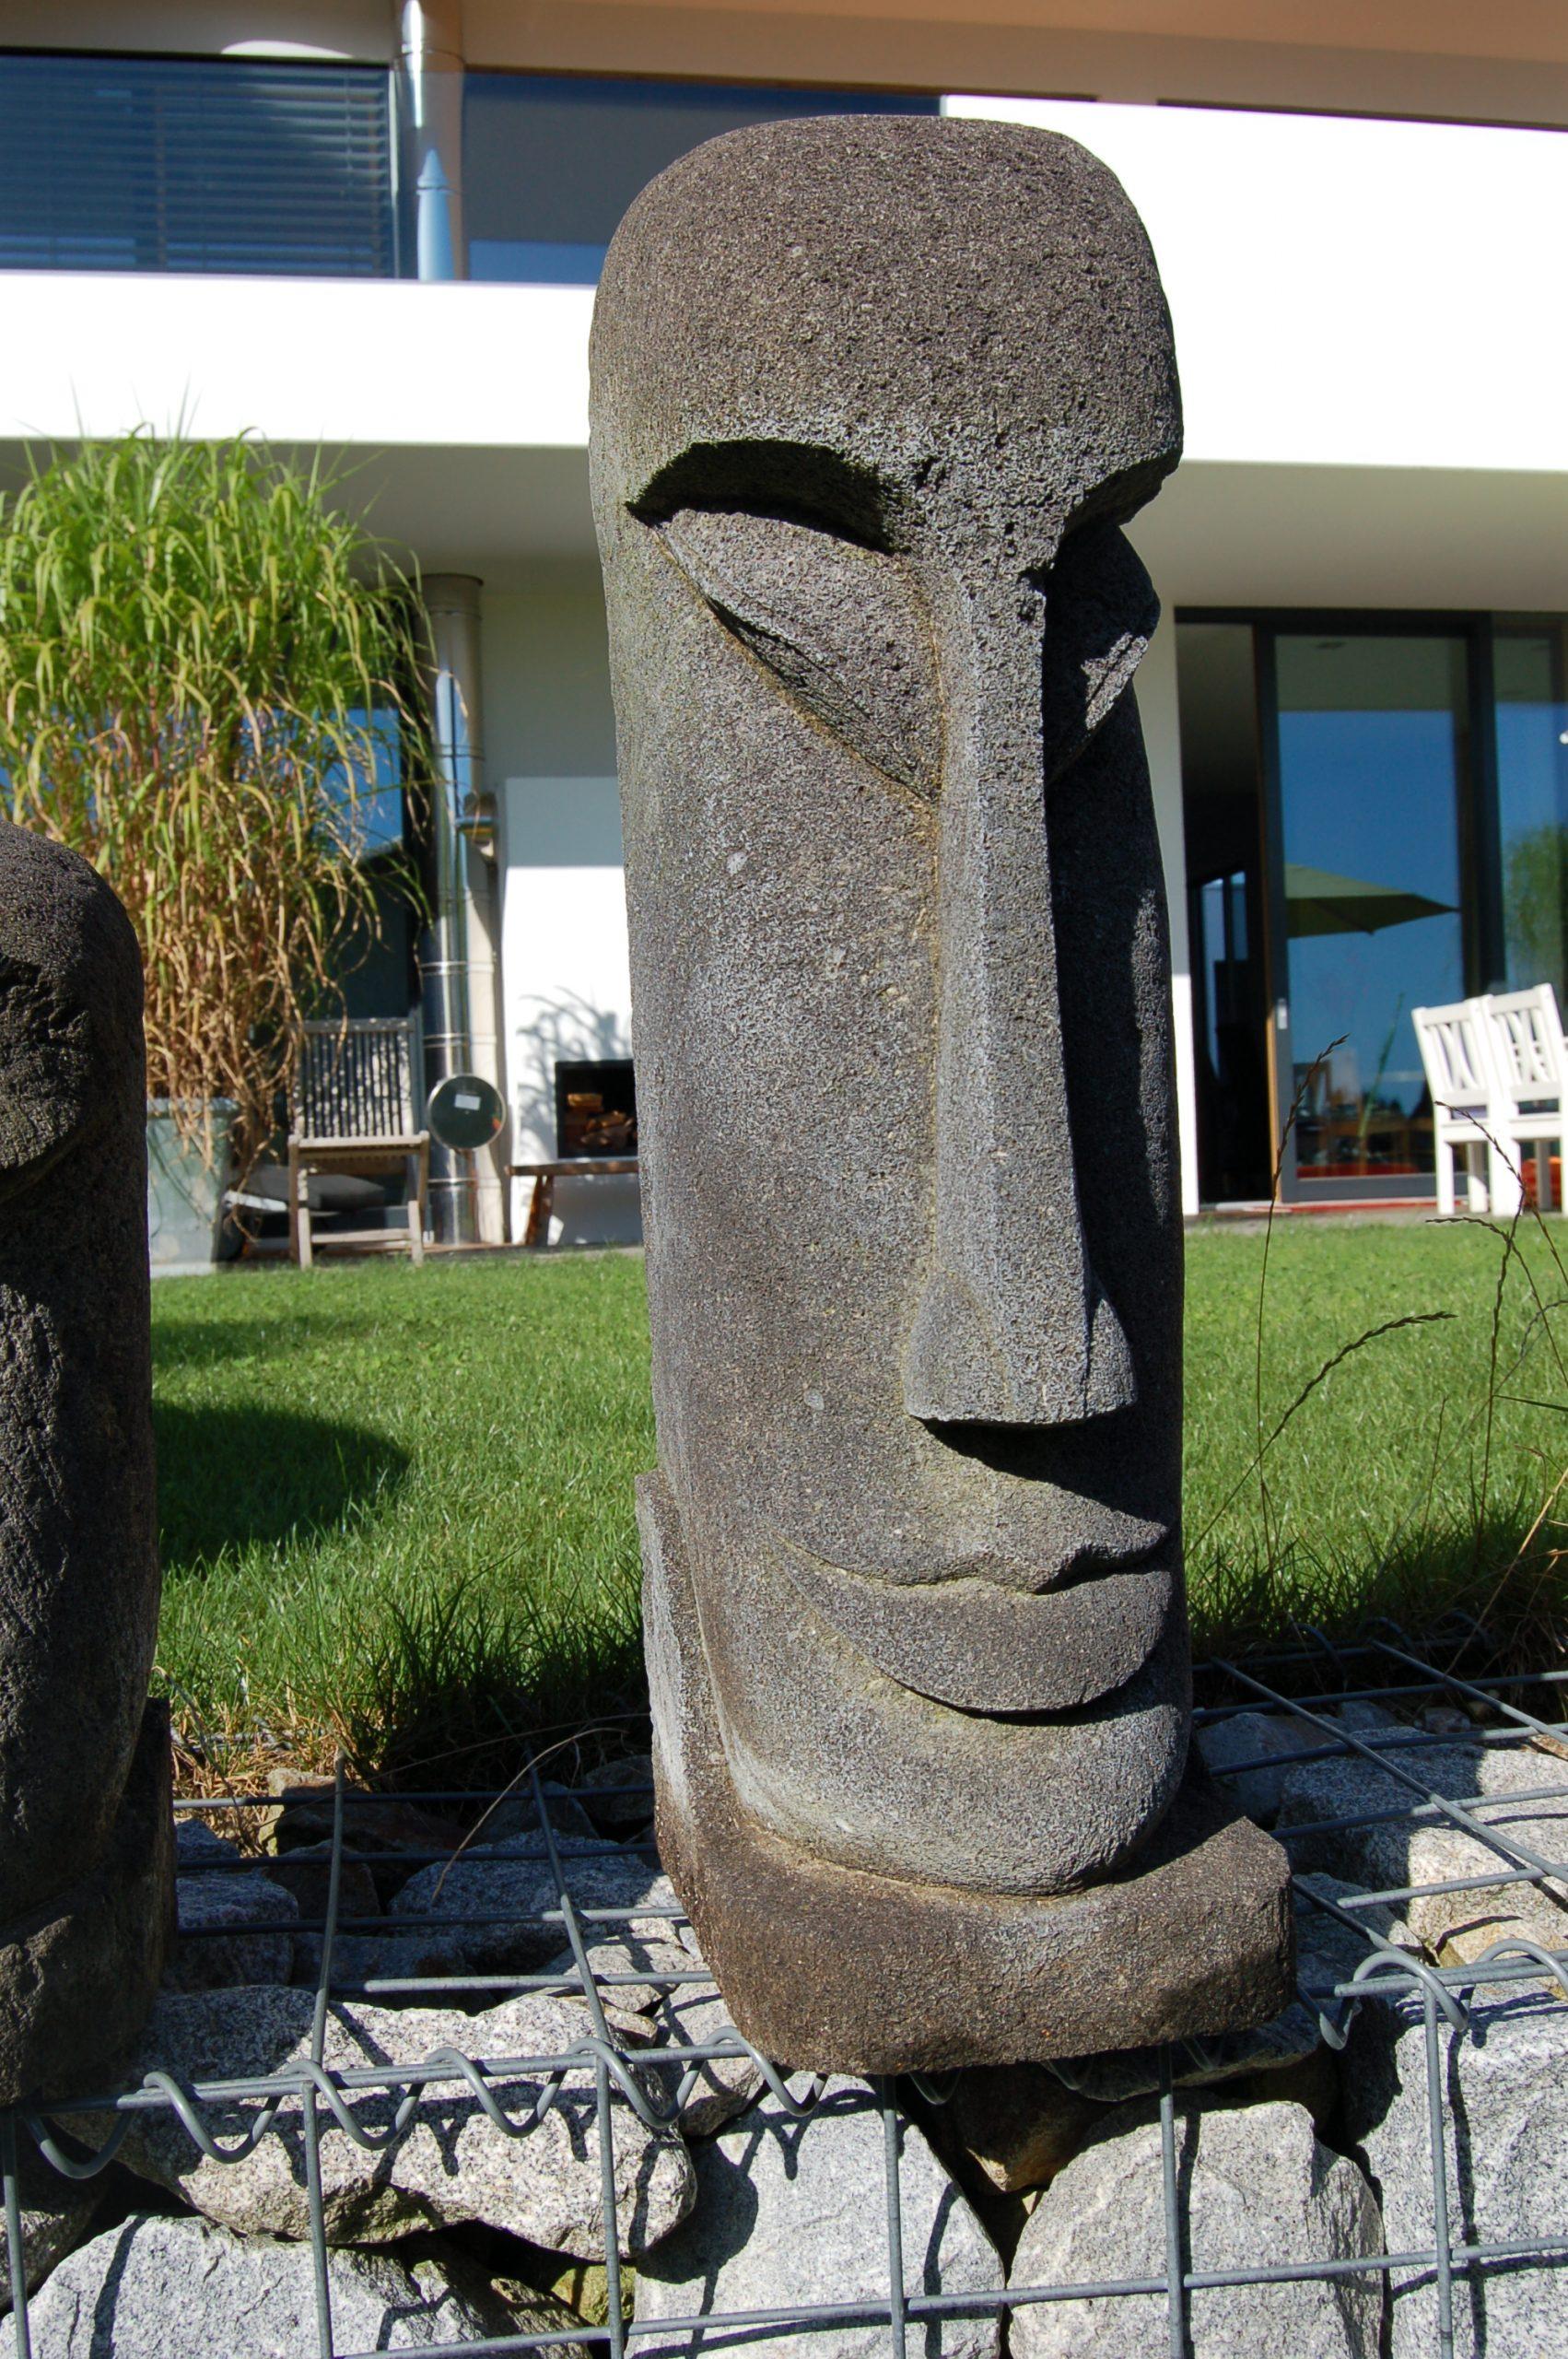 Full Size of Garten Skulpturen Moai Und Osterinsel Steinfiguren Als Moderne Gartenskulpturen Truhenbank Feuerstelle Sichtschutz Im Pergola Heizstrahler Relaxliege Garten Garten Skulpturen